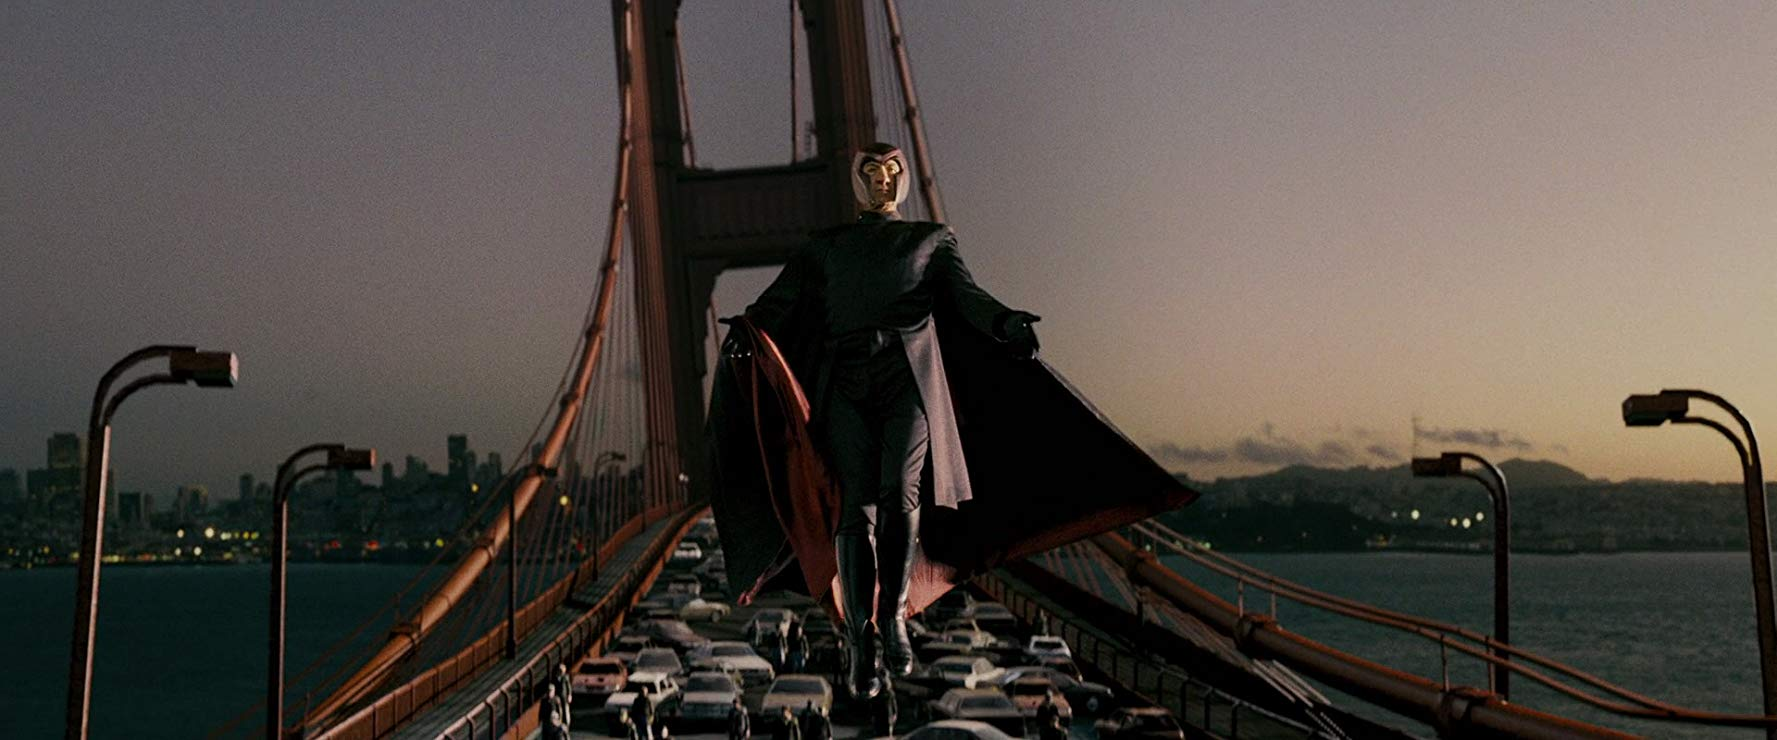 Magneto (Ian McKellan) warps the Golden Gate Bridge in X-Men The Last Stand (2006)